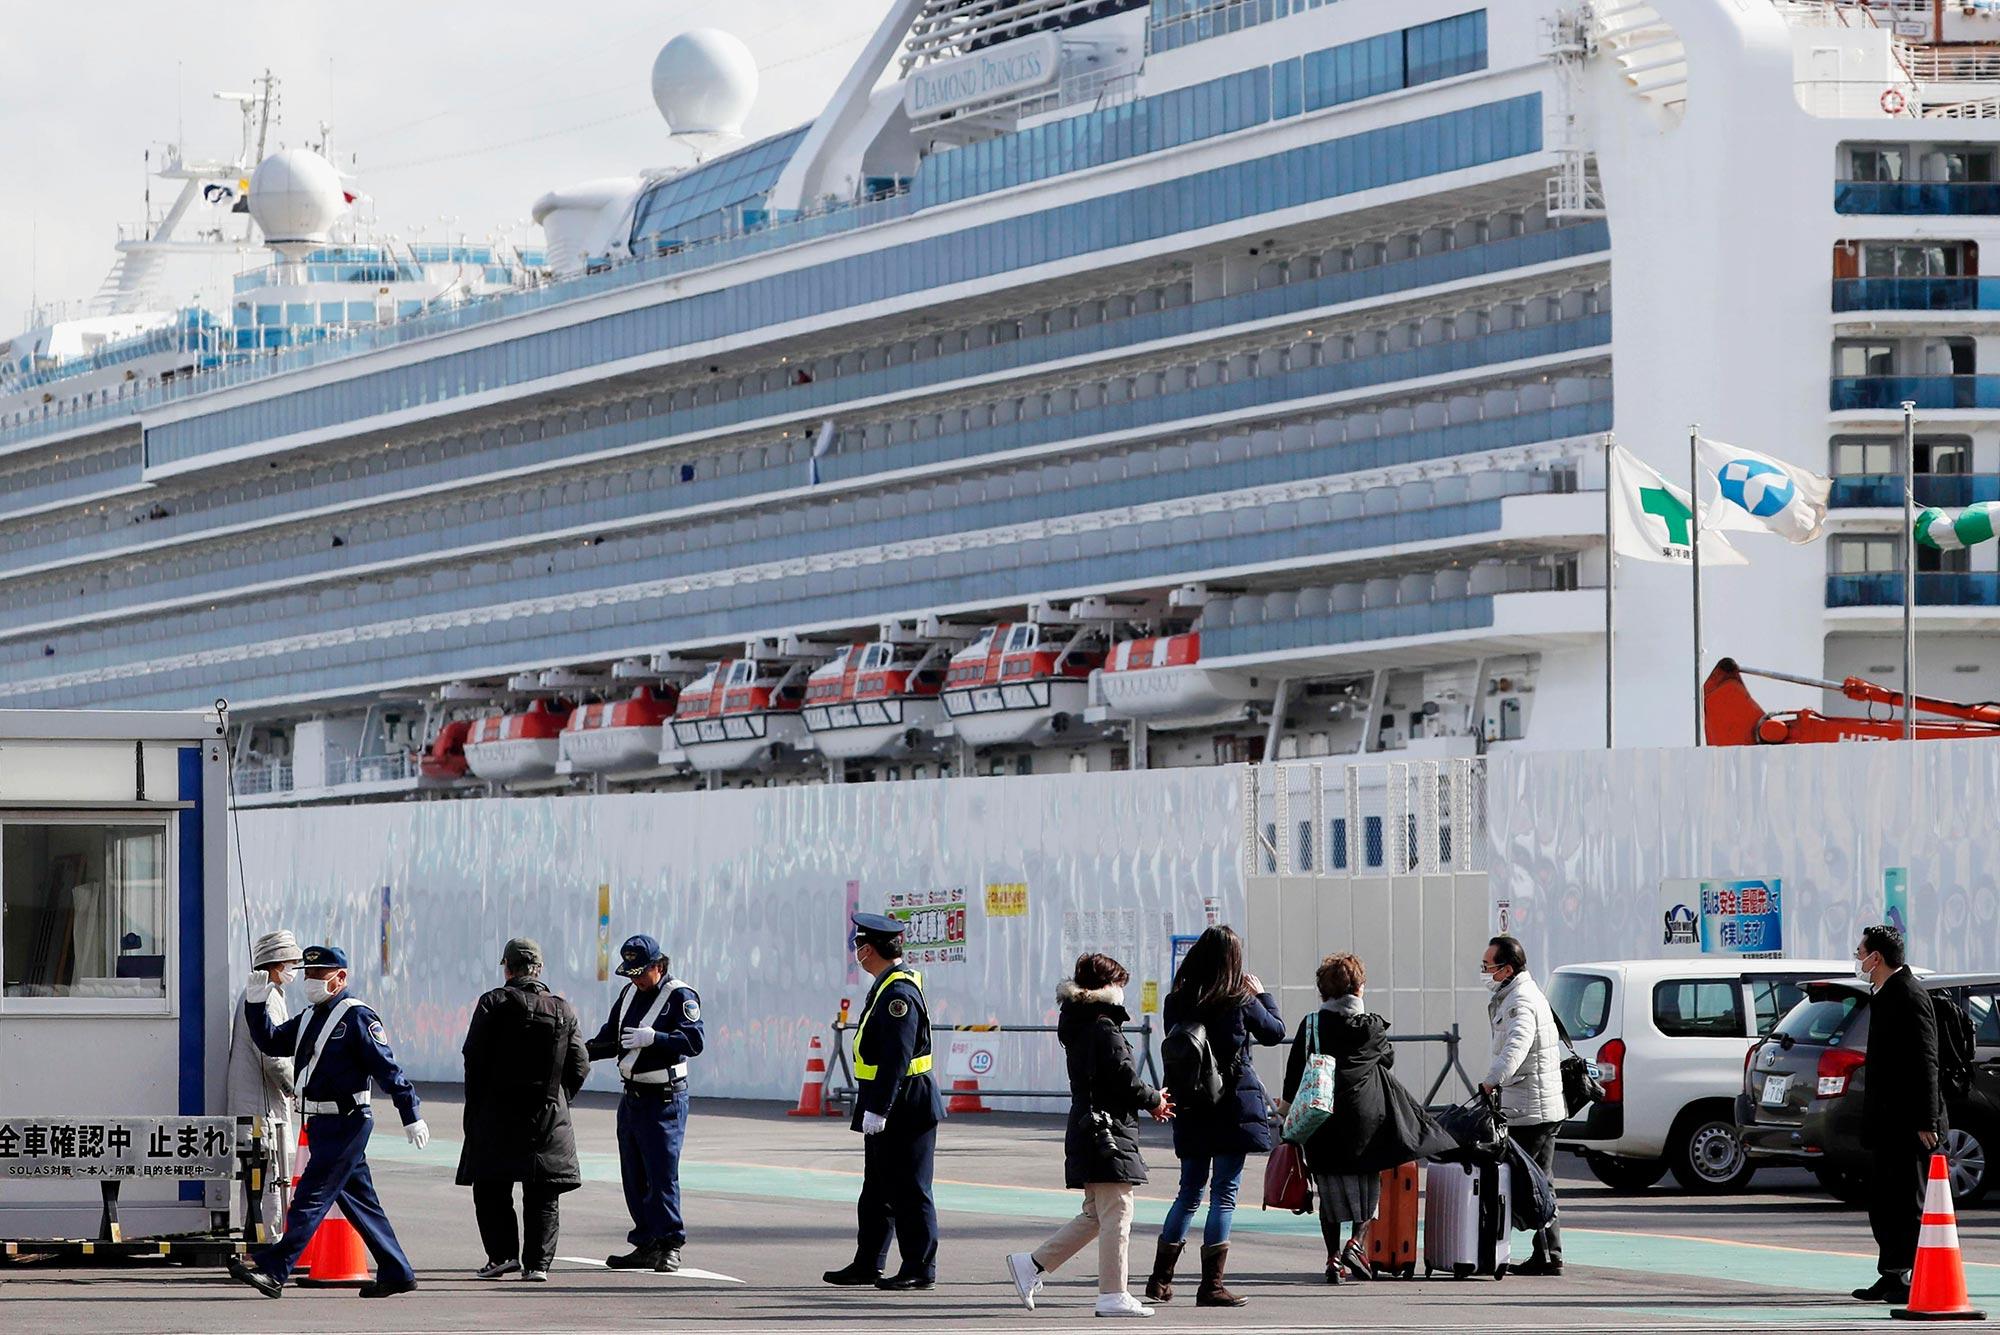 Coronavirus Is Hitting the Cruise Line Industry Hard | BU Today ...